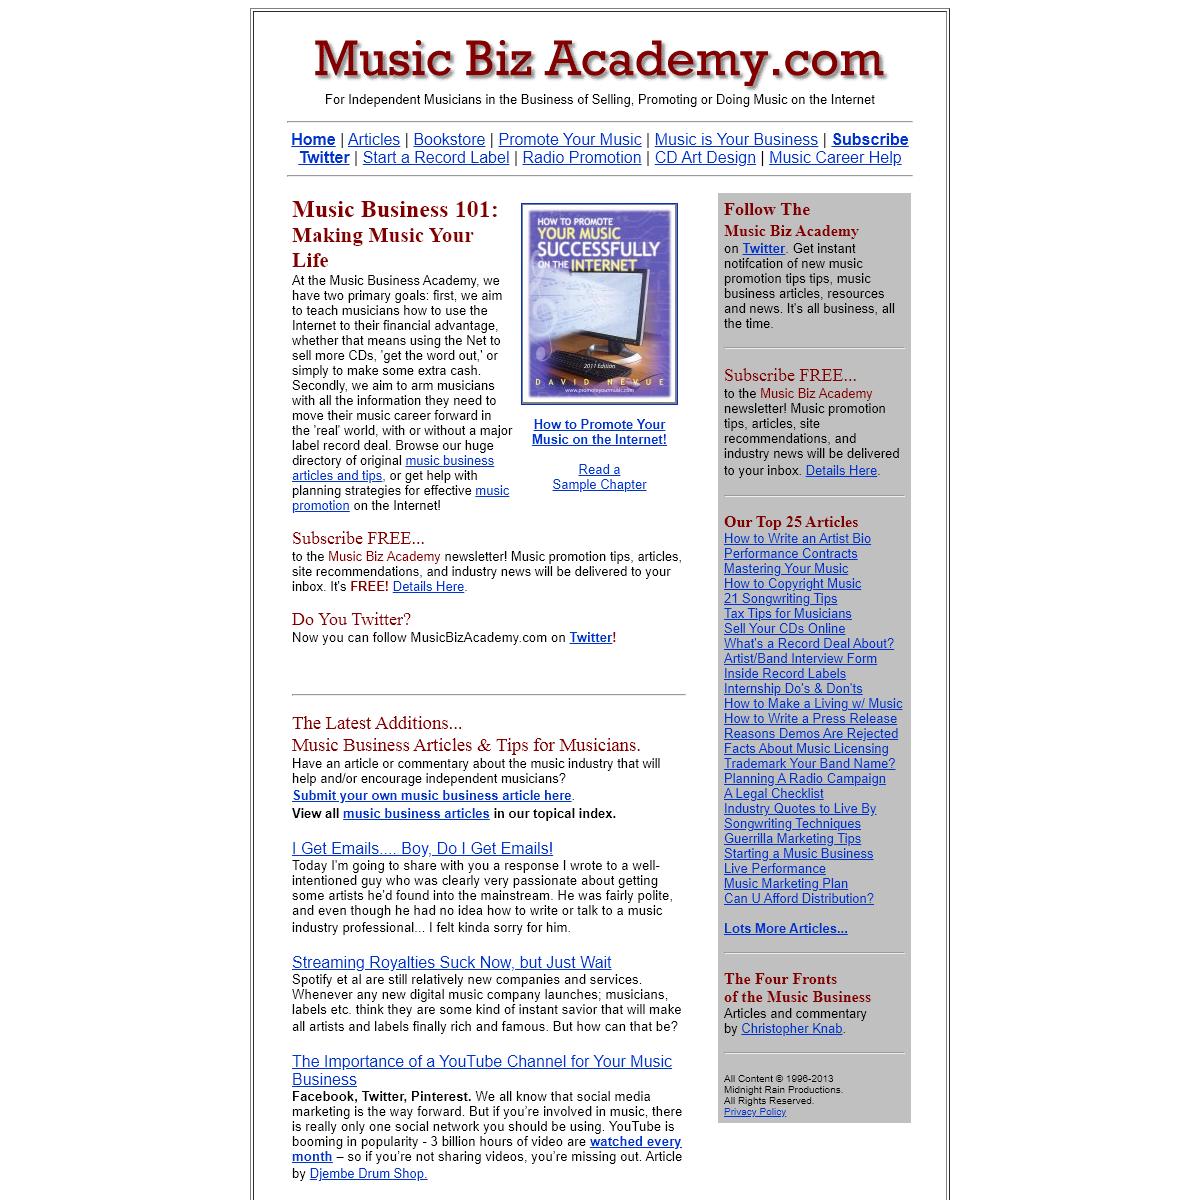 The Music Biz Academy- Music Business 101